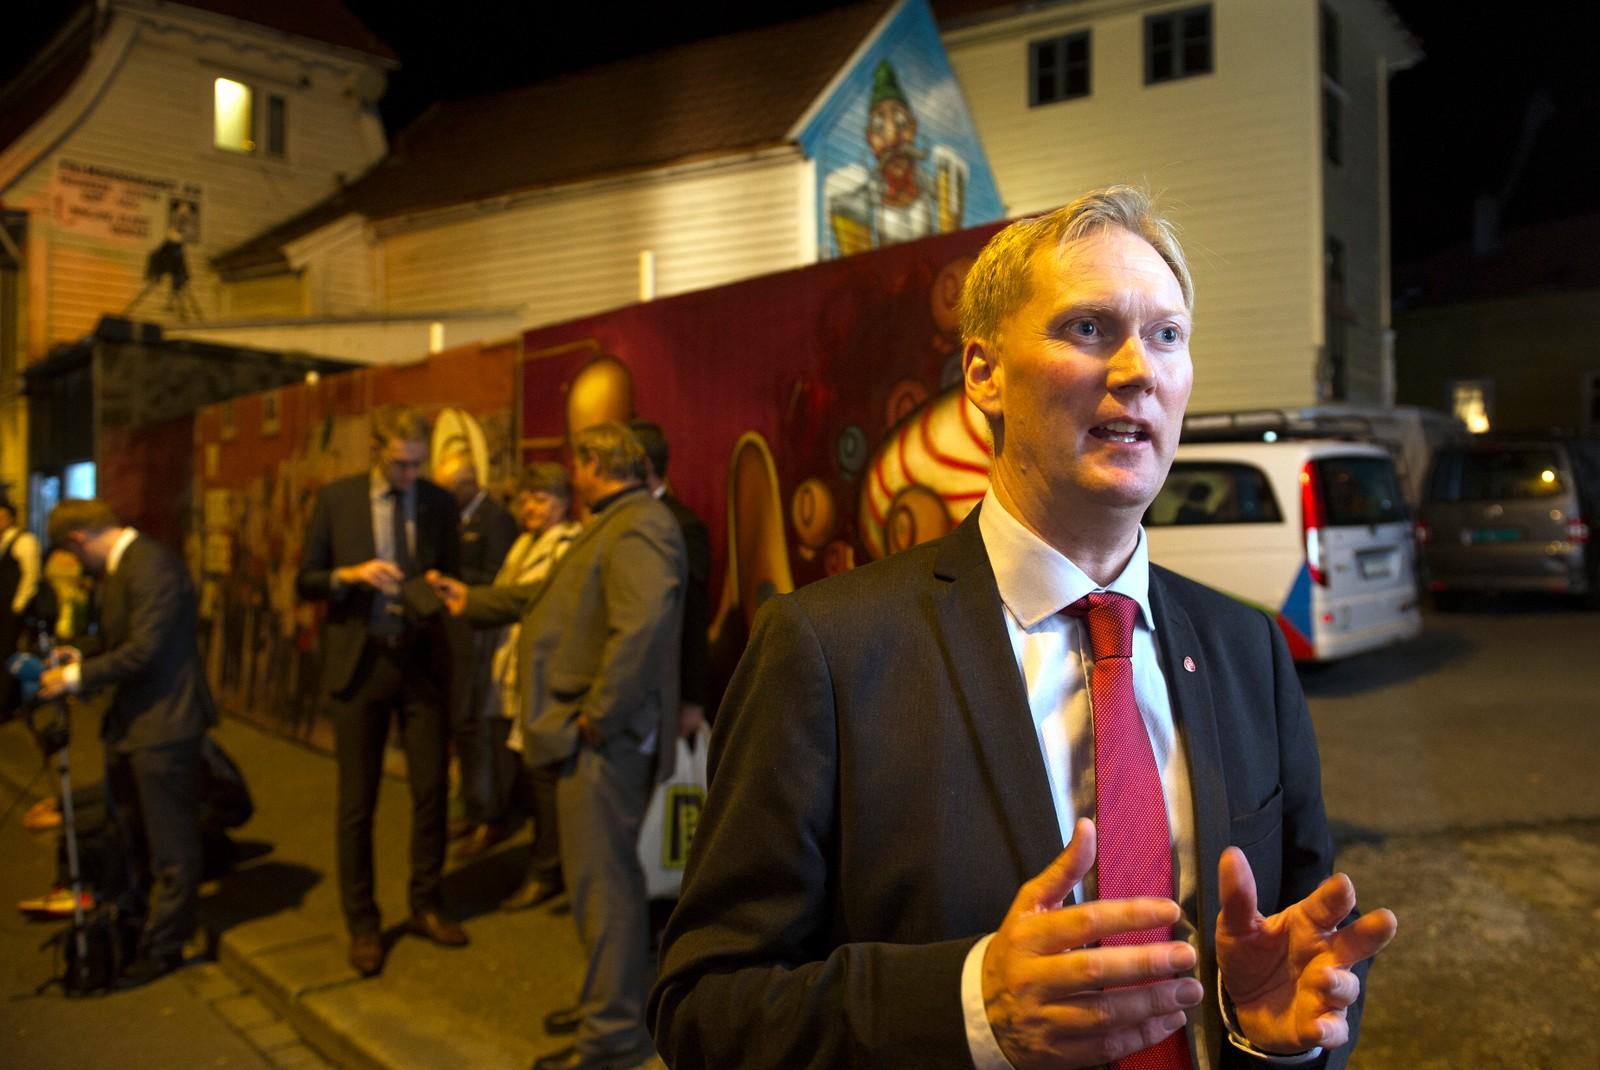 APs byrådslederkandidat i Bergen, Harald Schjelderup på Arbeiderpartiets valgvake. Foto: Marit Hommedal / NTB scanpix